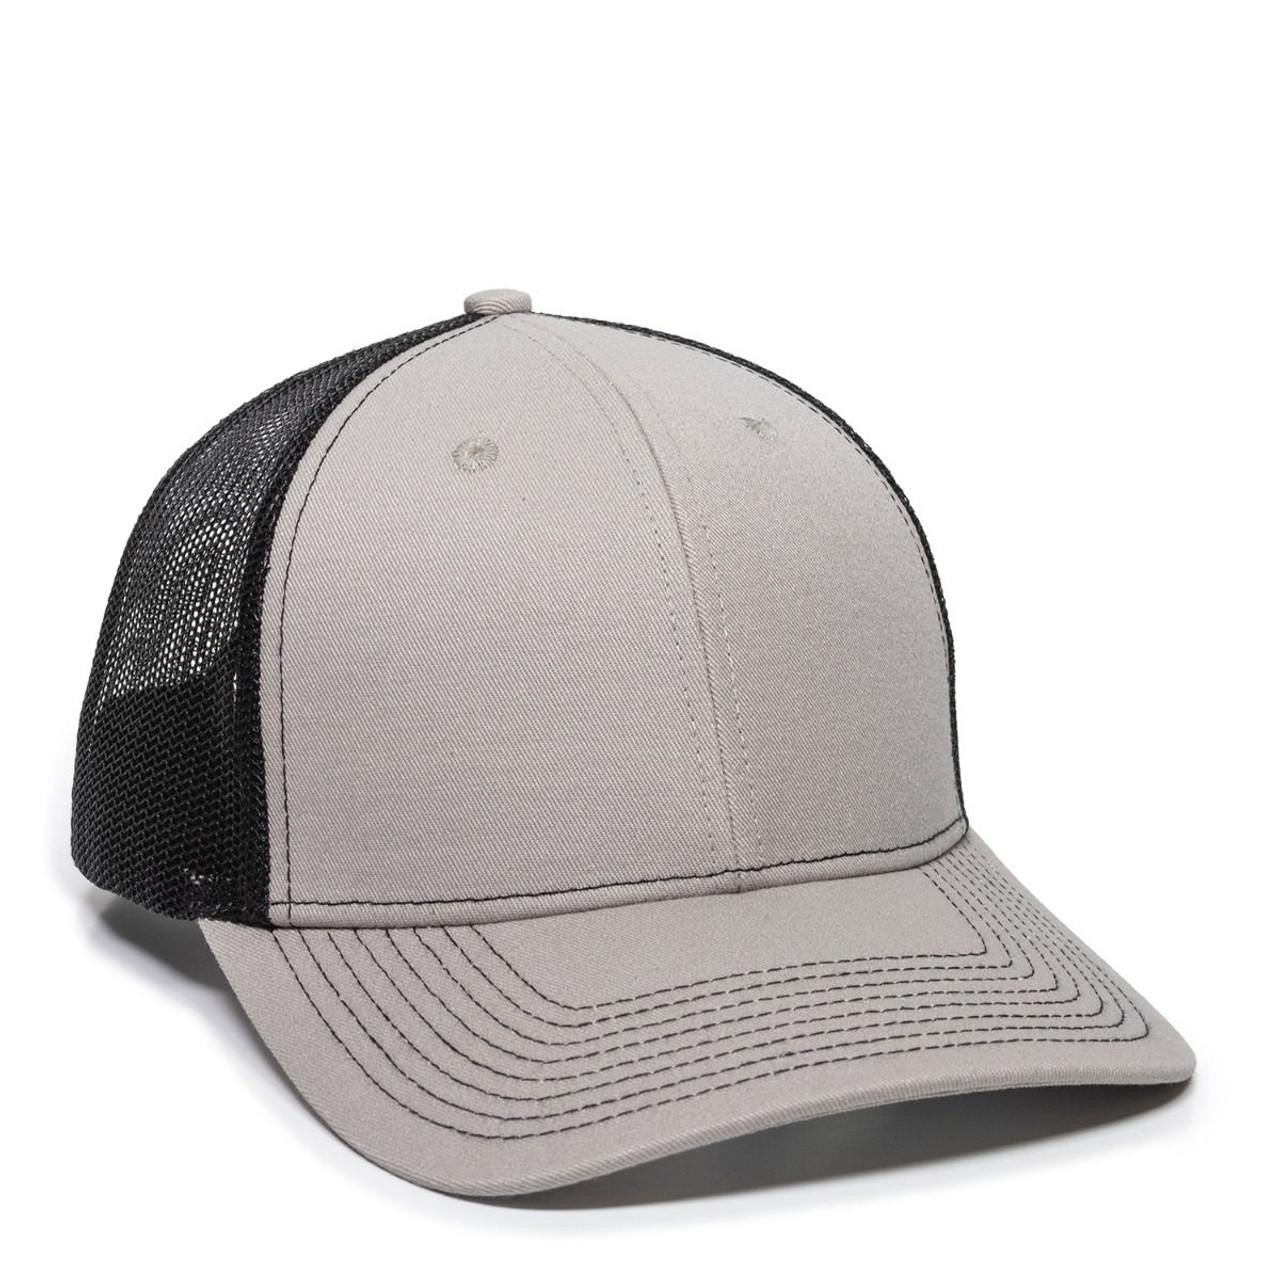 The Ultimate Trucker Custom Hats